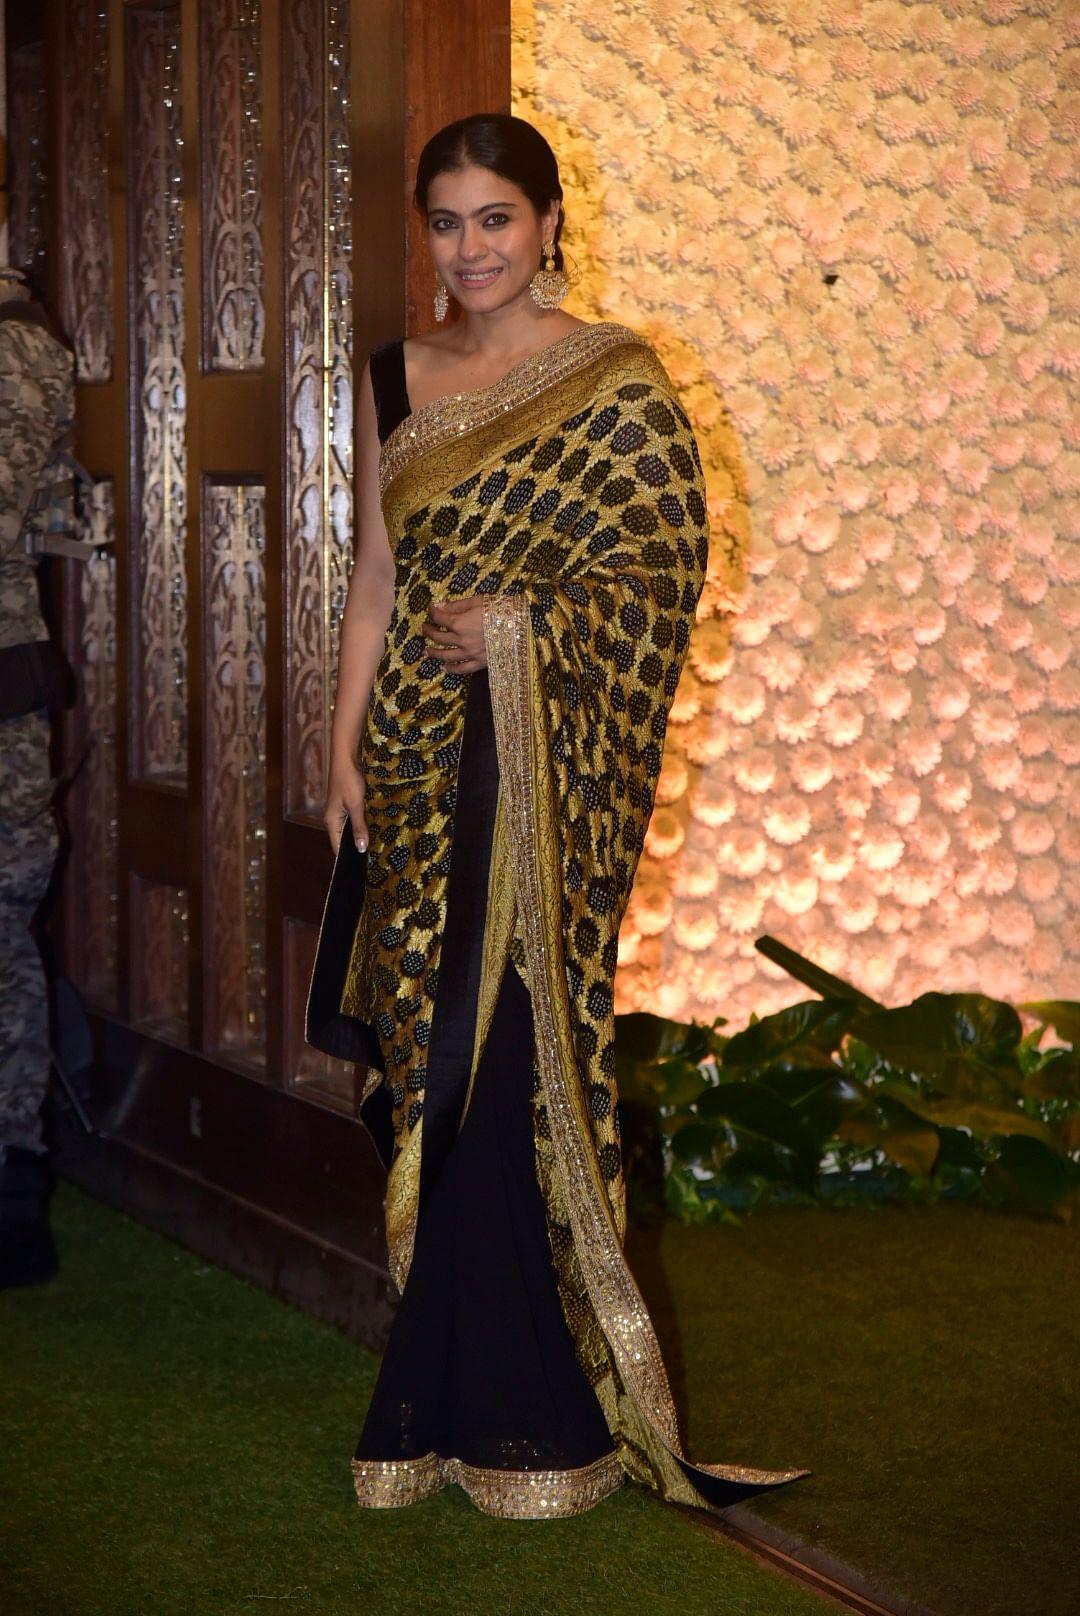 Kajol donned a Golden black saree at the Ambani's Ganpati festivaties